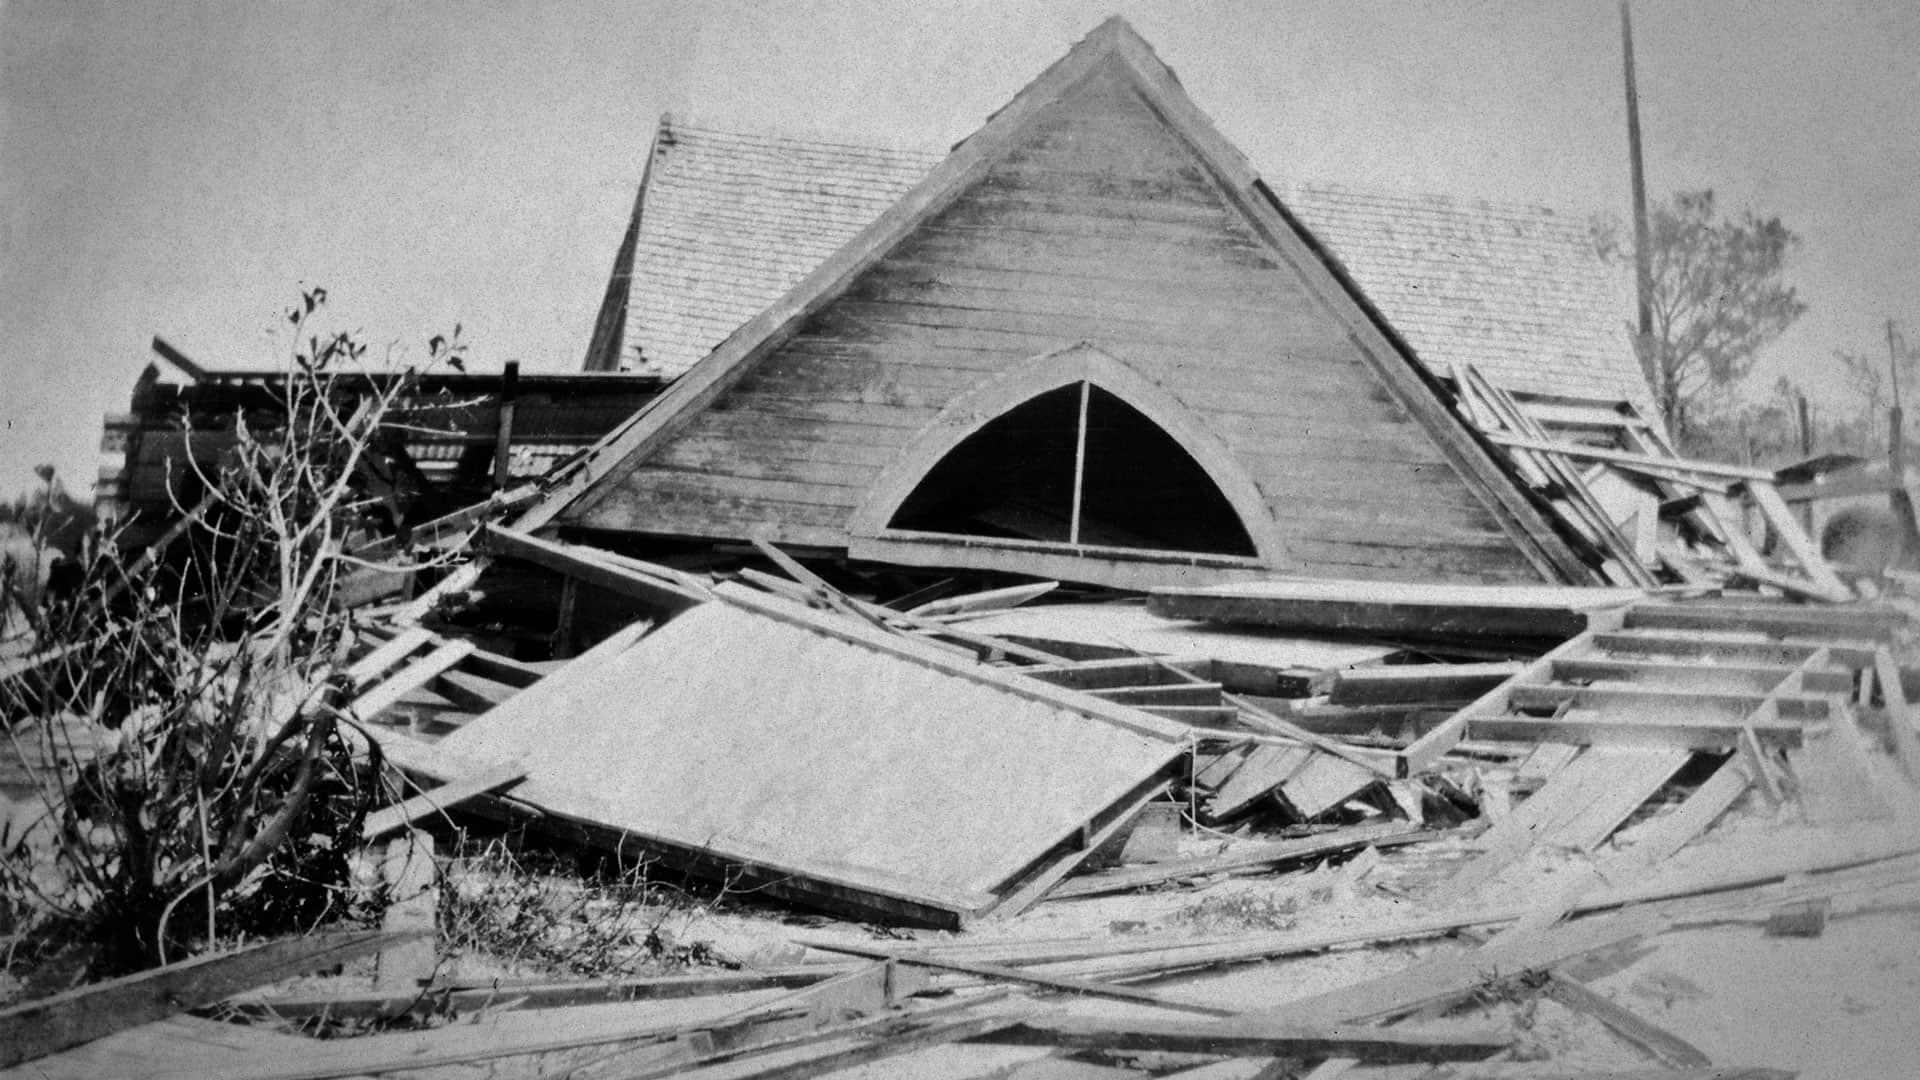 Hurricane damage in early Deerfield Beach, FL